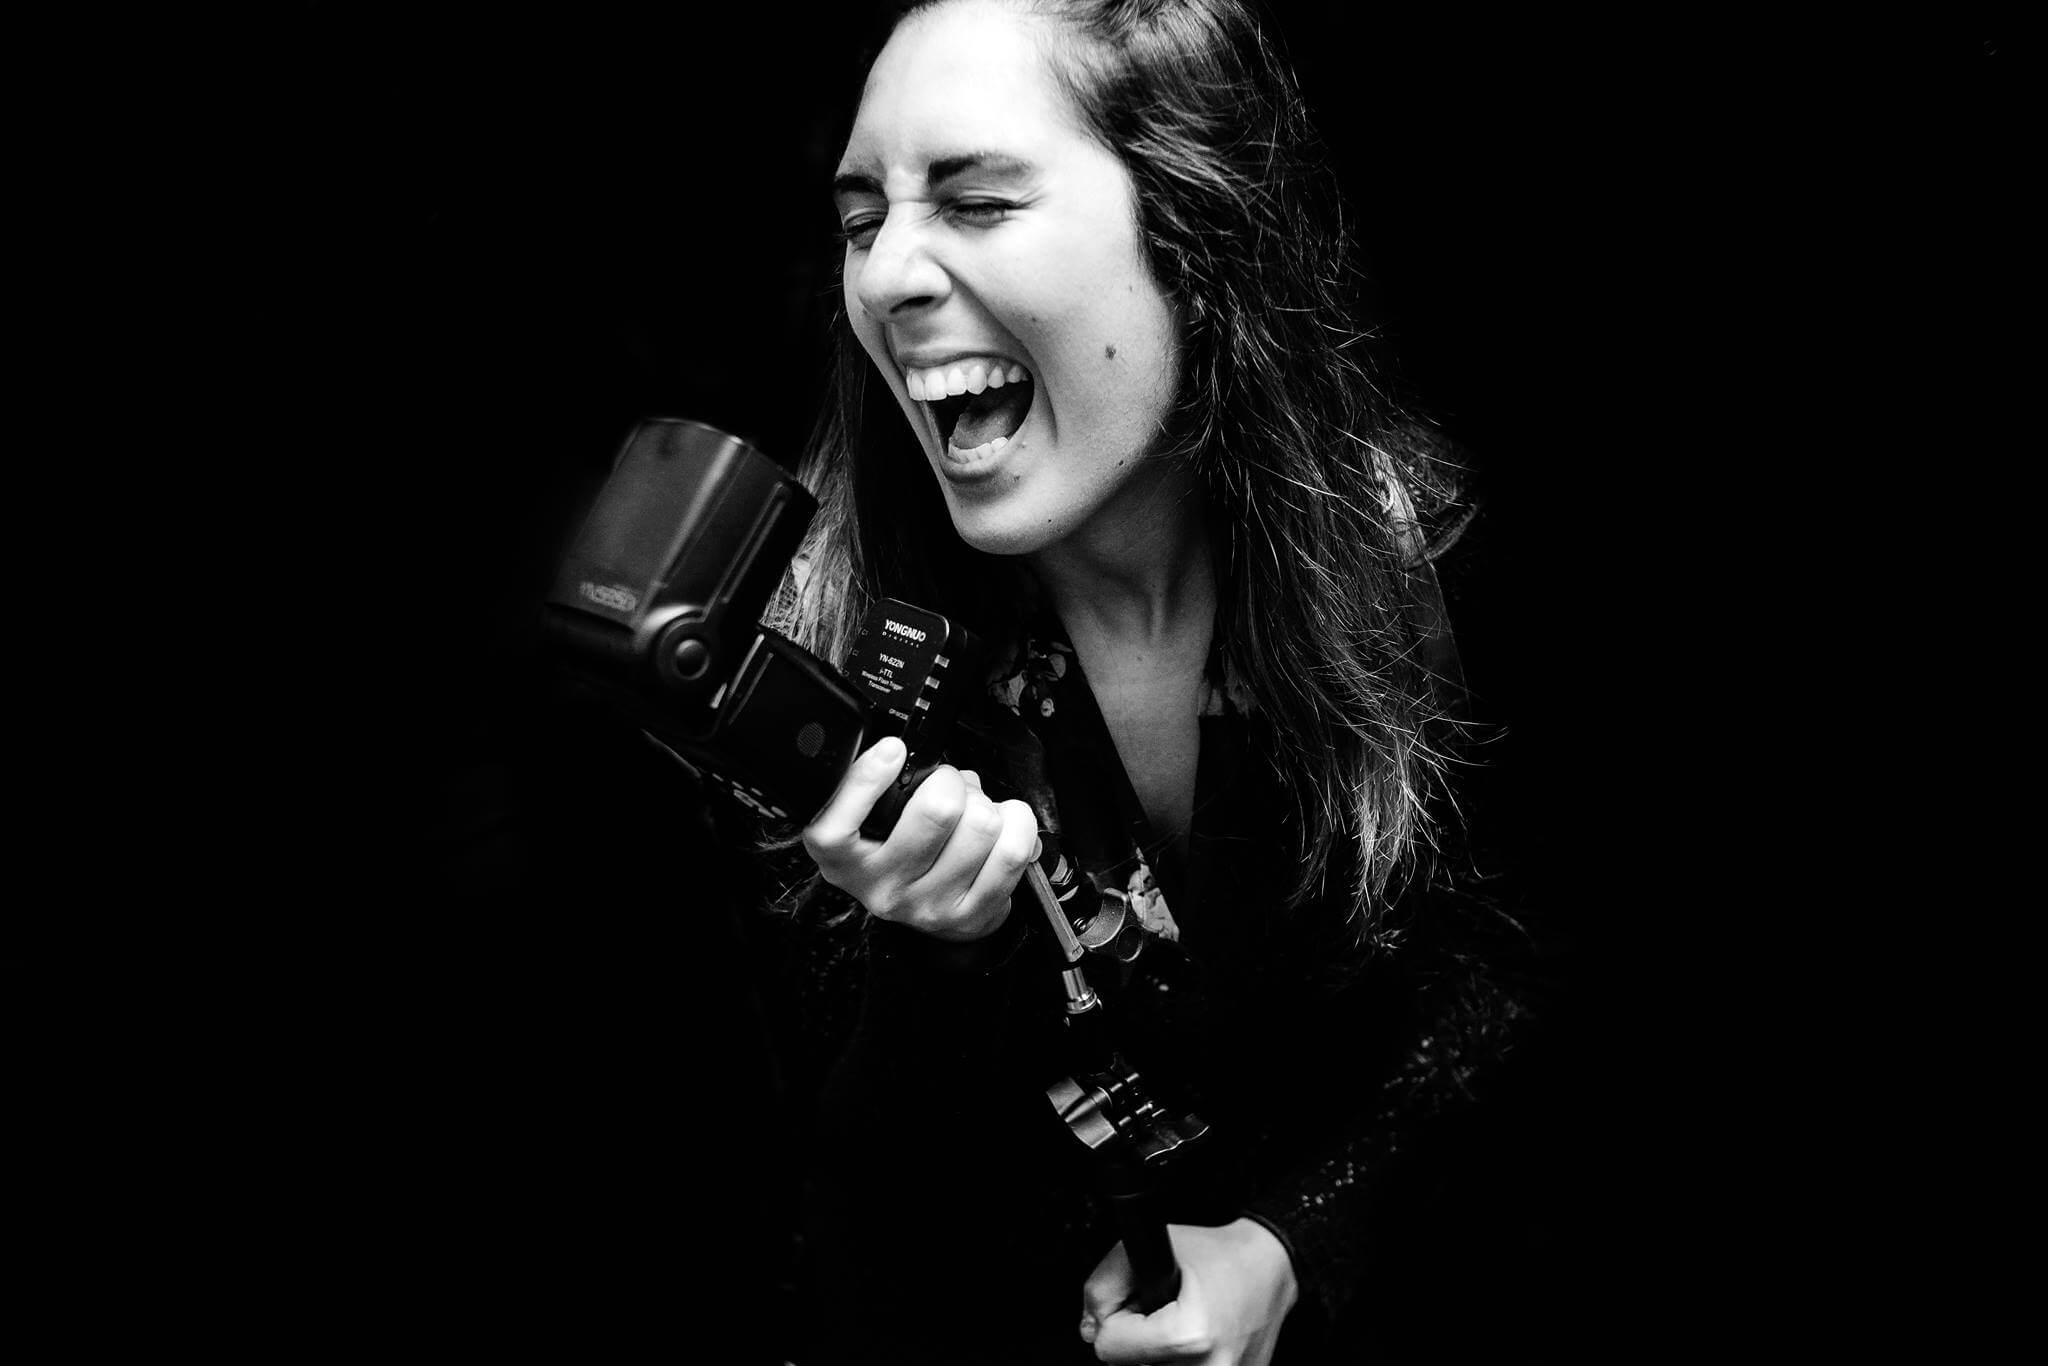 flechaenblanco-fotografo-documental-de-bodas-españa-europa-latinoamerica